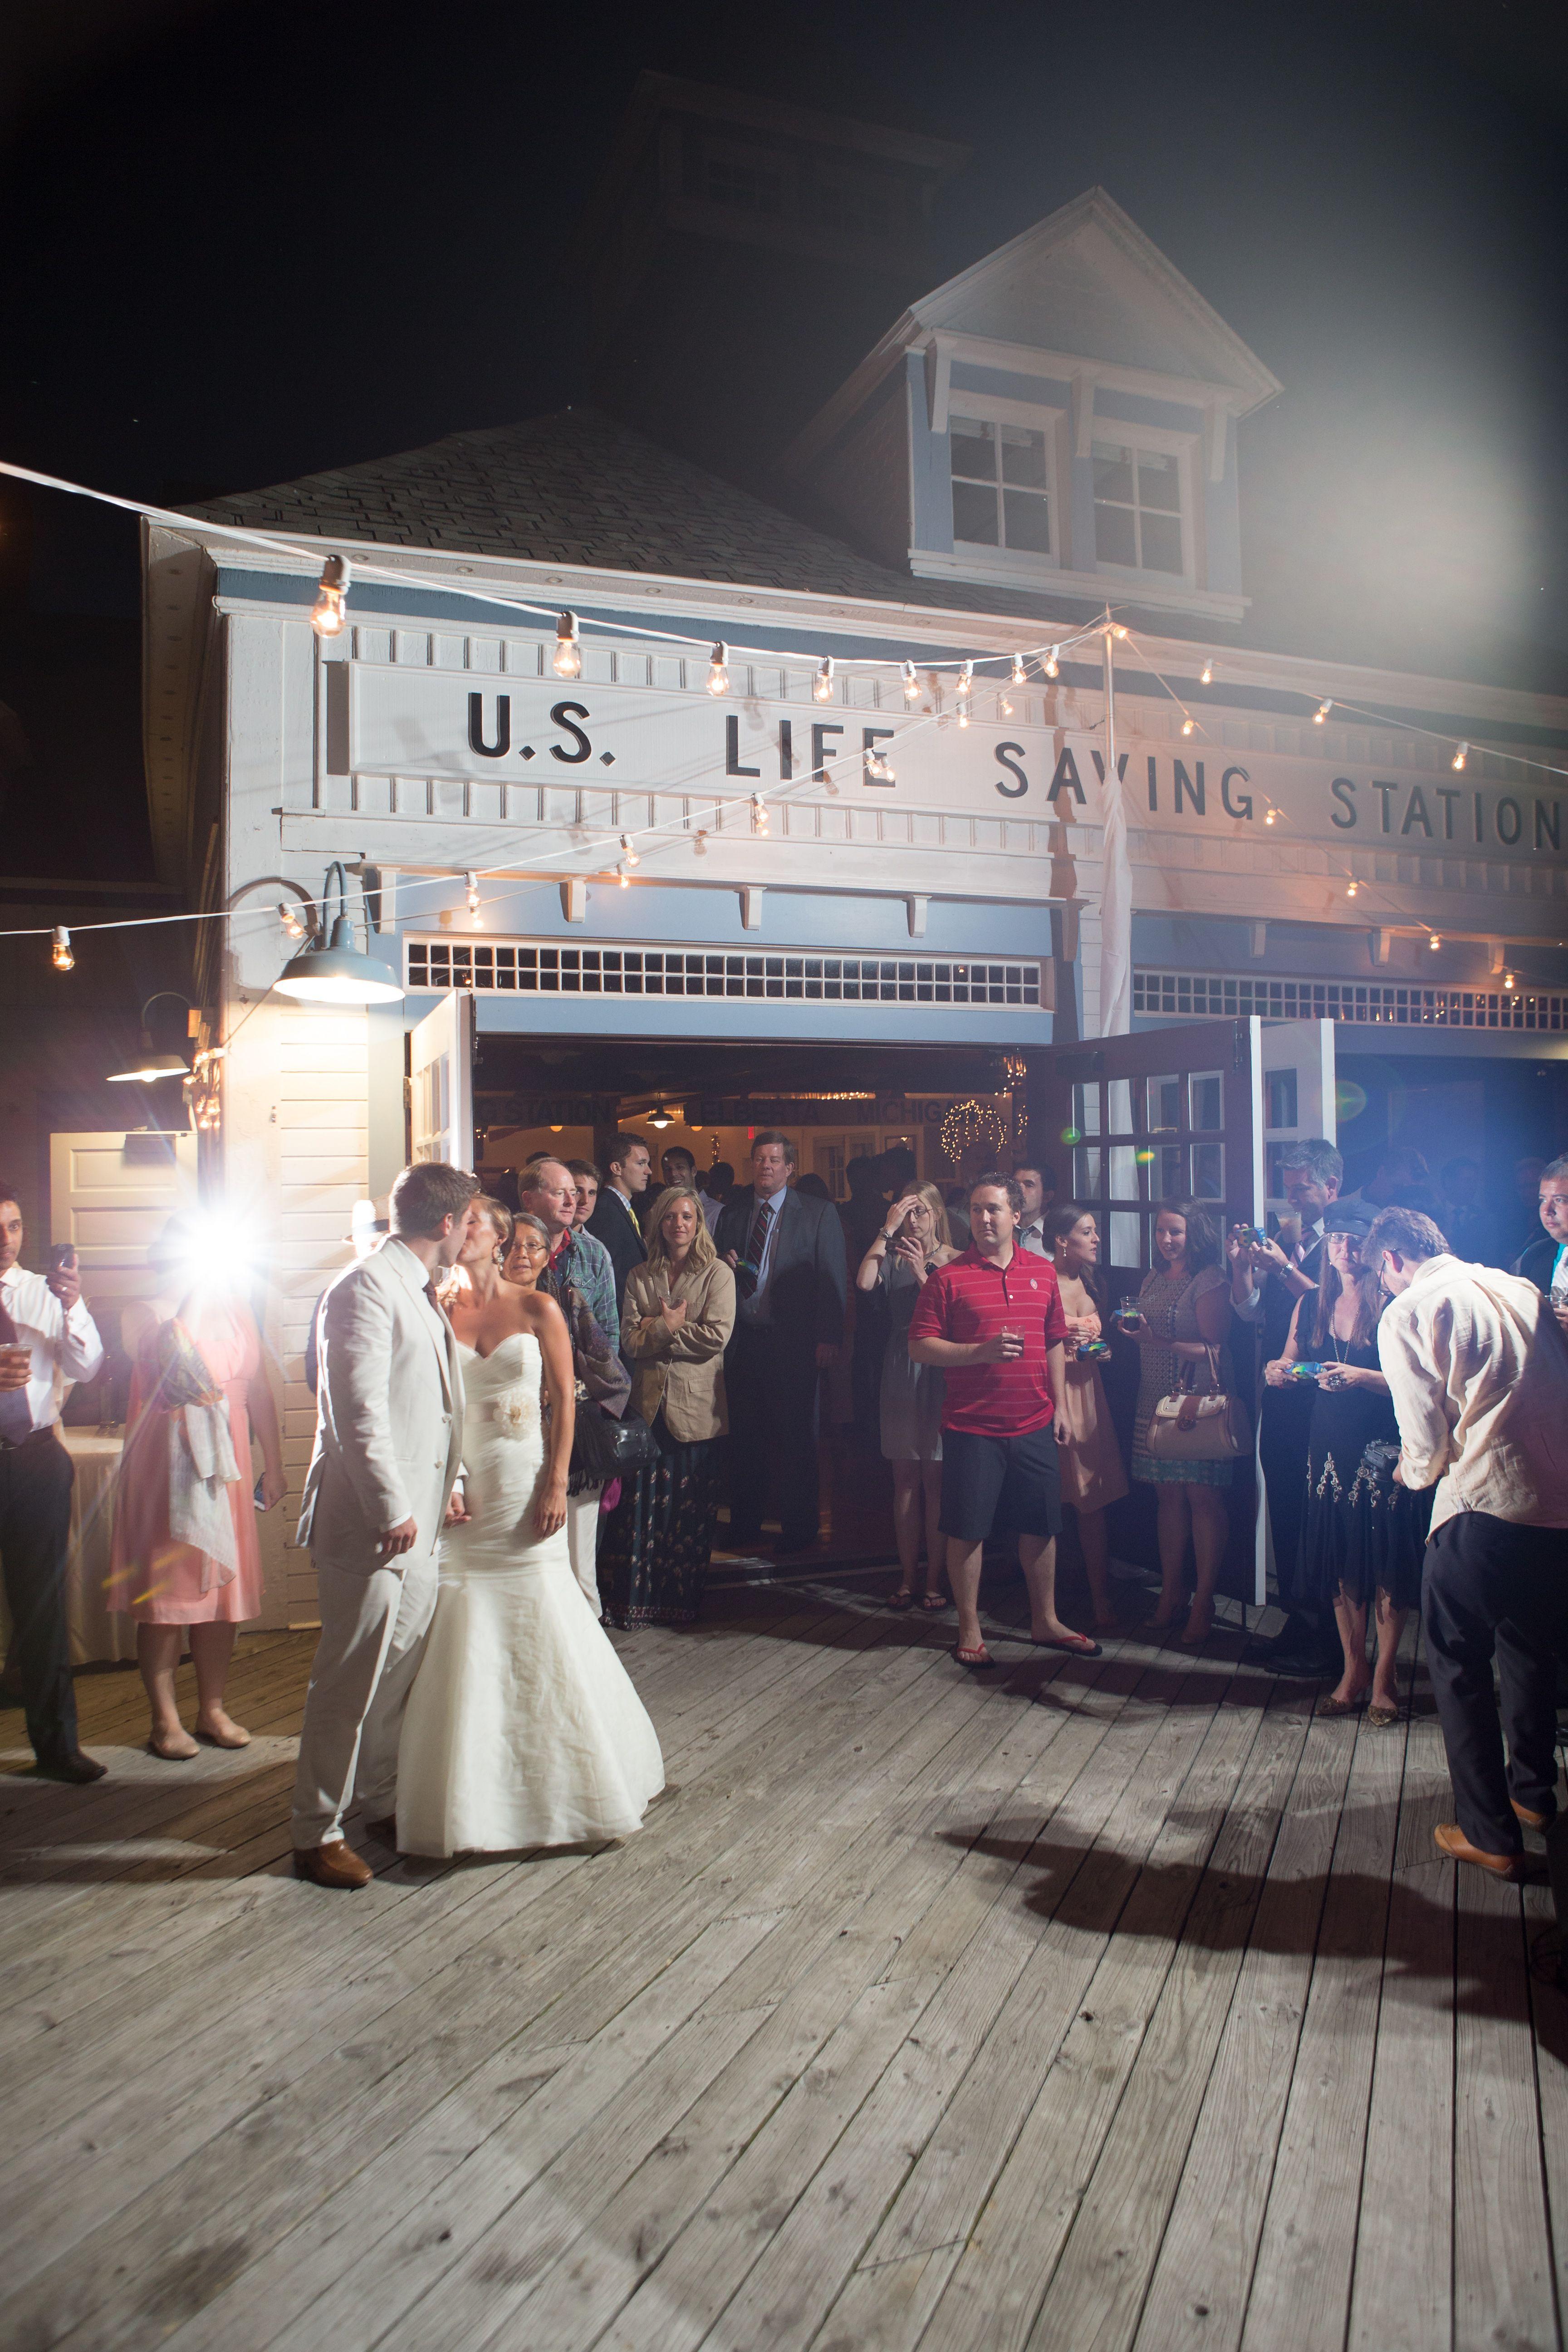 Outdoor Wedding Reception Northern Michigan Elberta Life Saving Station First Dance Photo